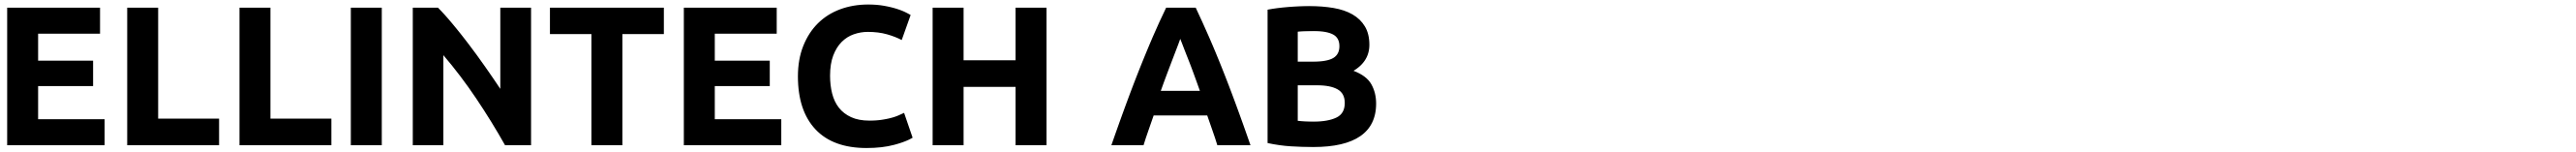 ELLINTECH AB